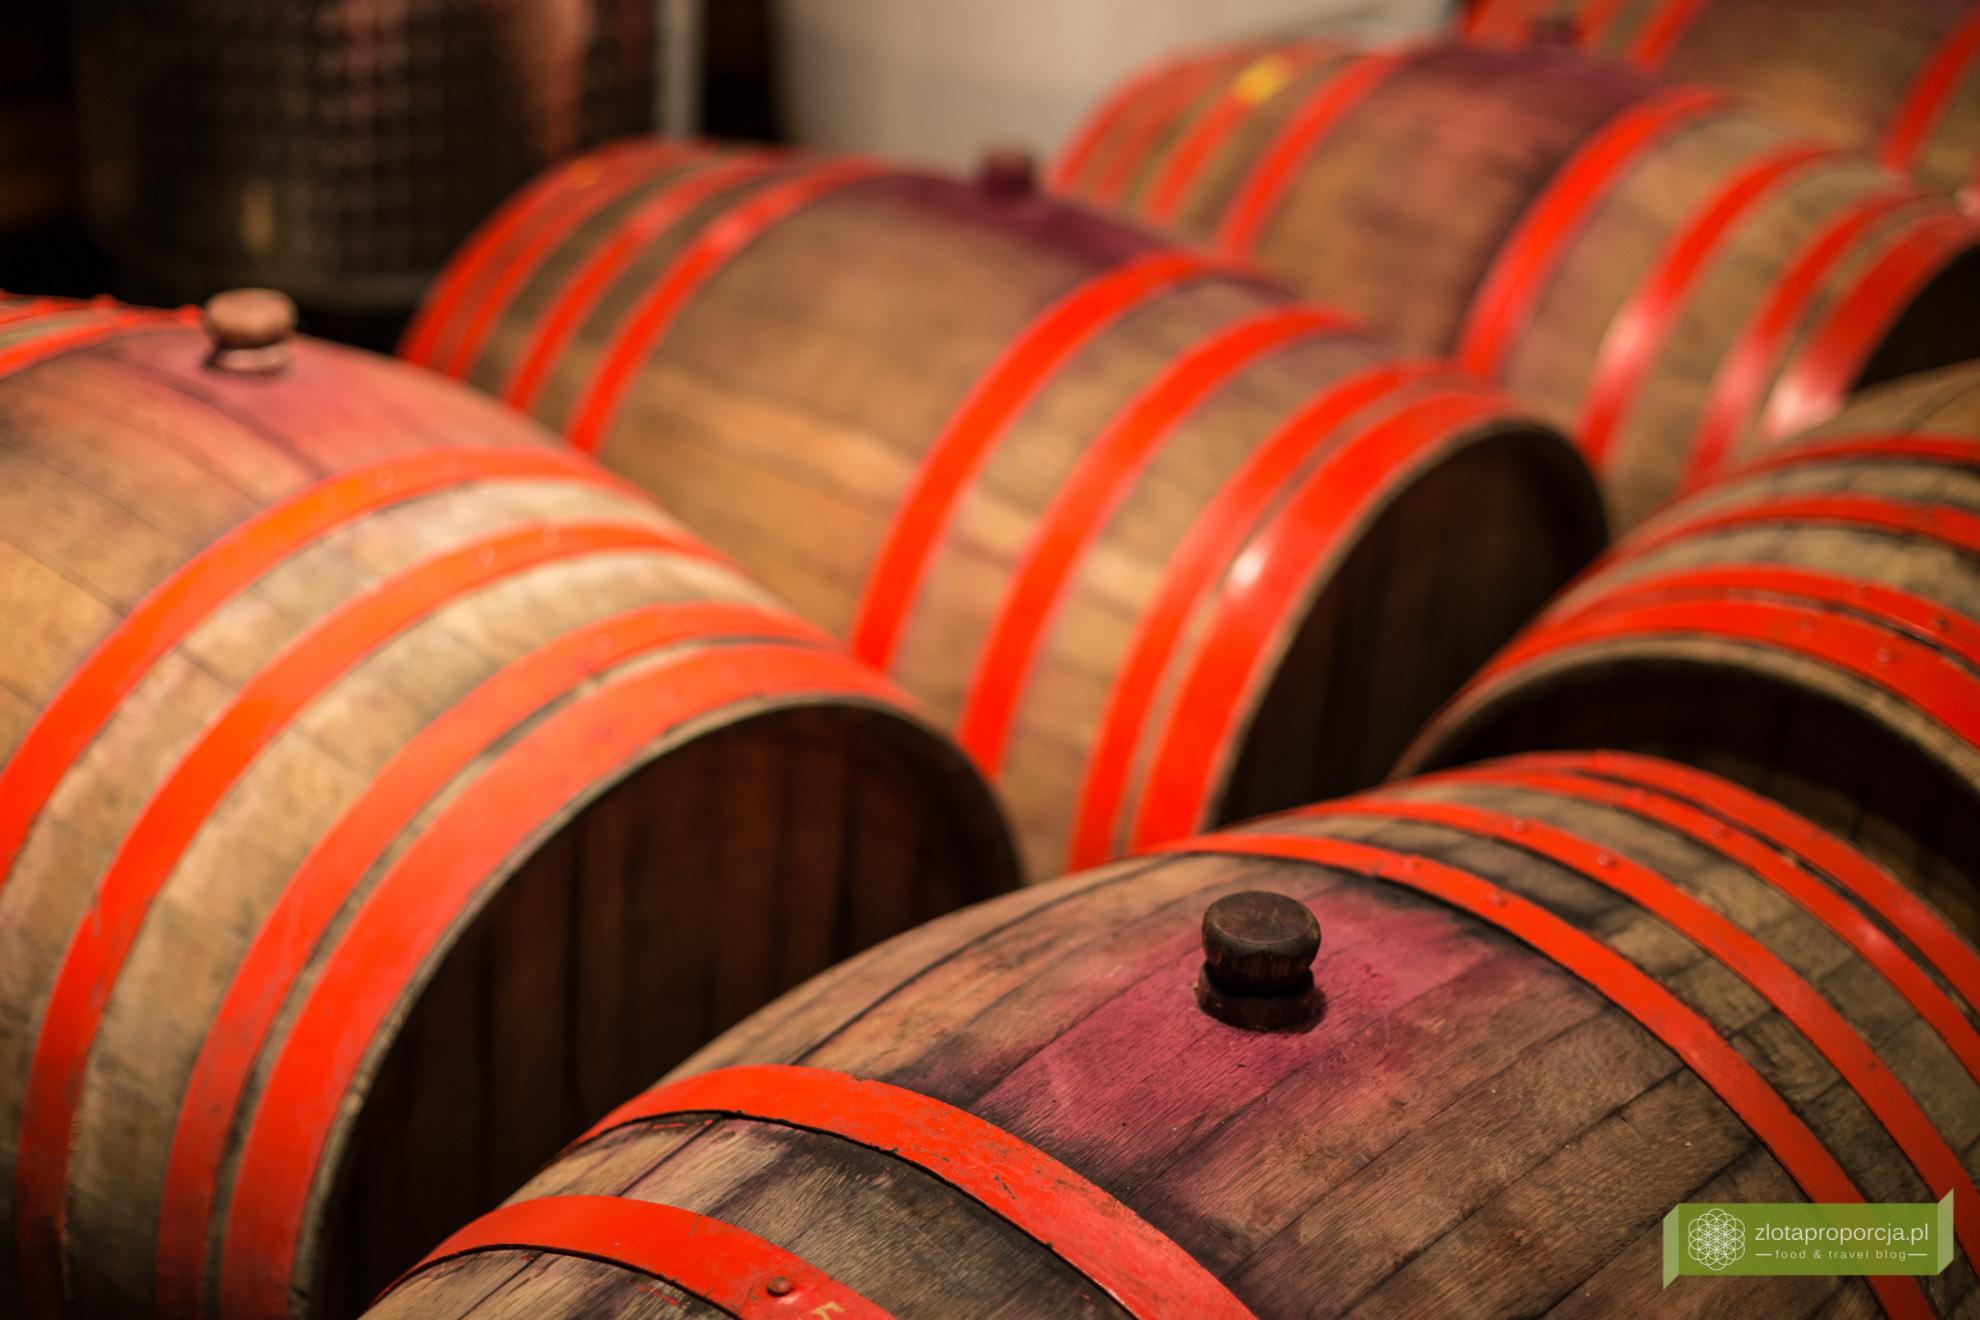 winnica Dwie Granice, Karpacki Szlak Wina, winnice na Podkarpaciu, winnice Podkarpacia,